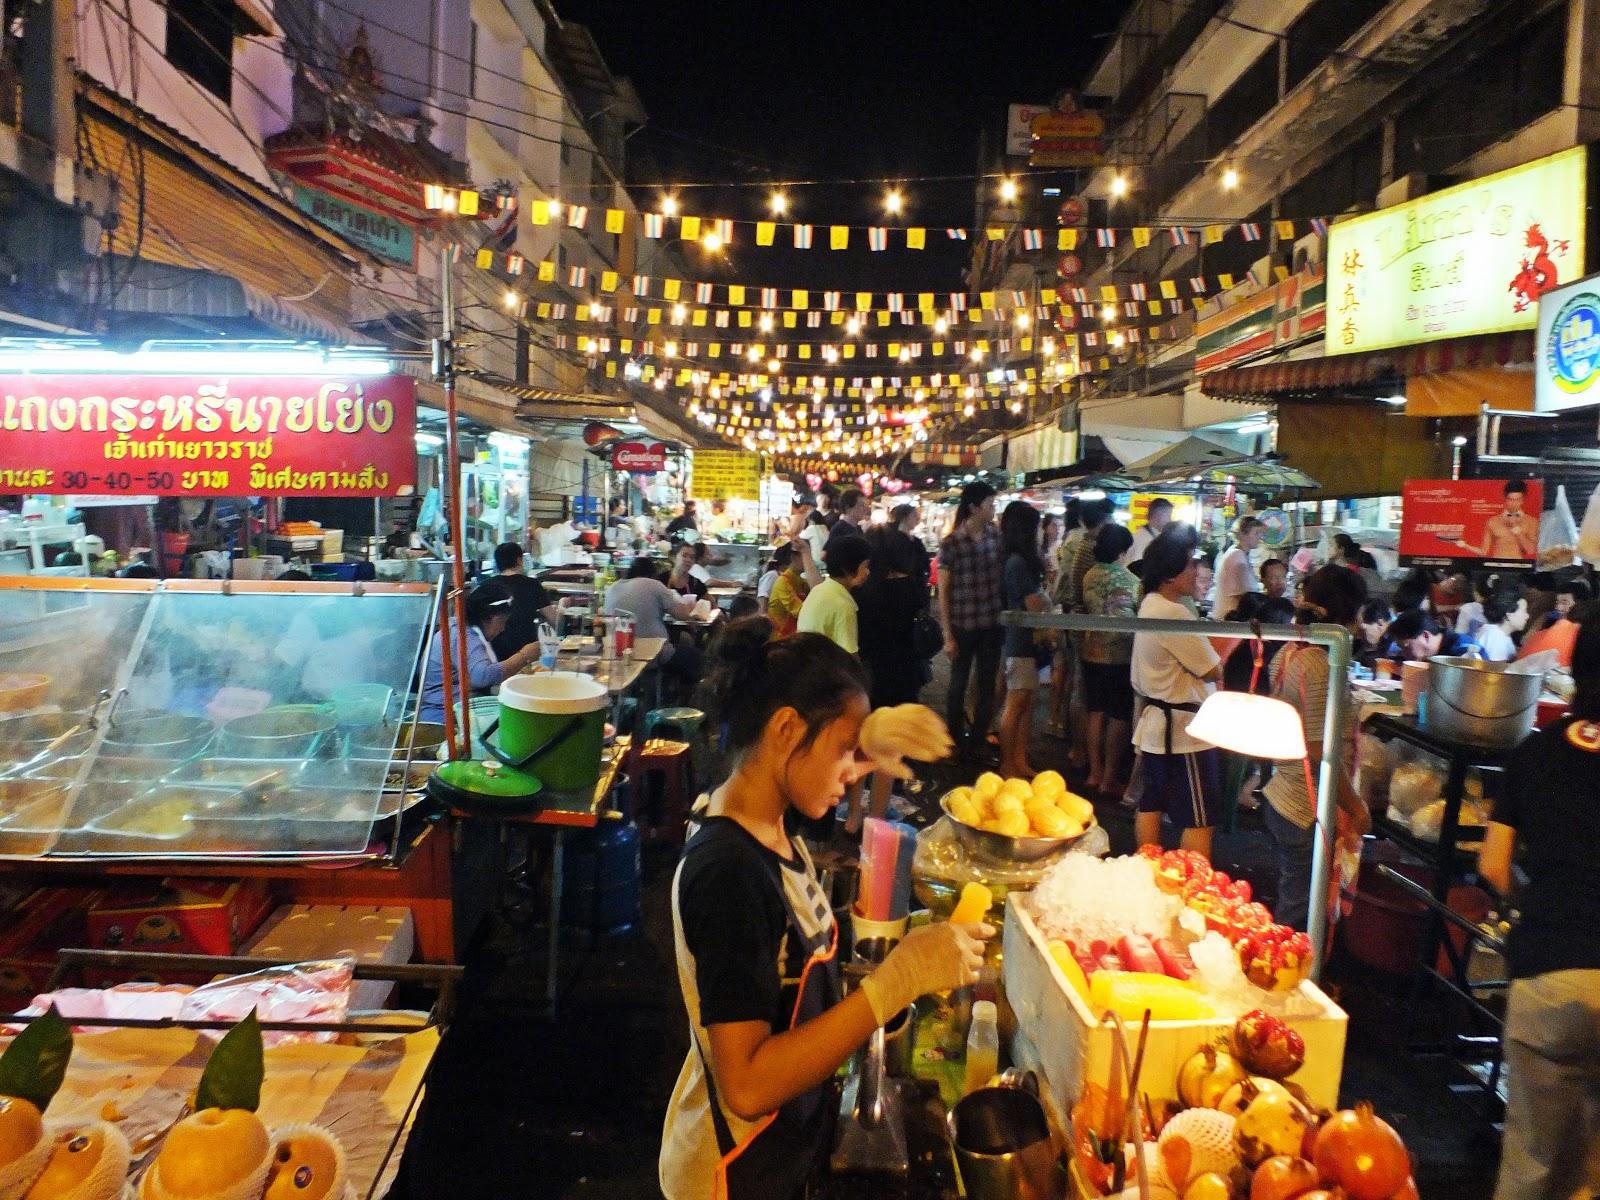 Venoths Culinary Adventures: Street Food @ Chinatown, Bangkok